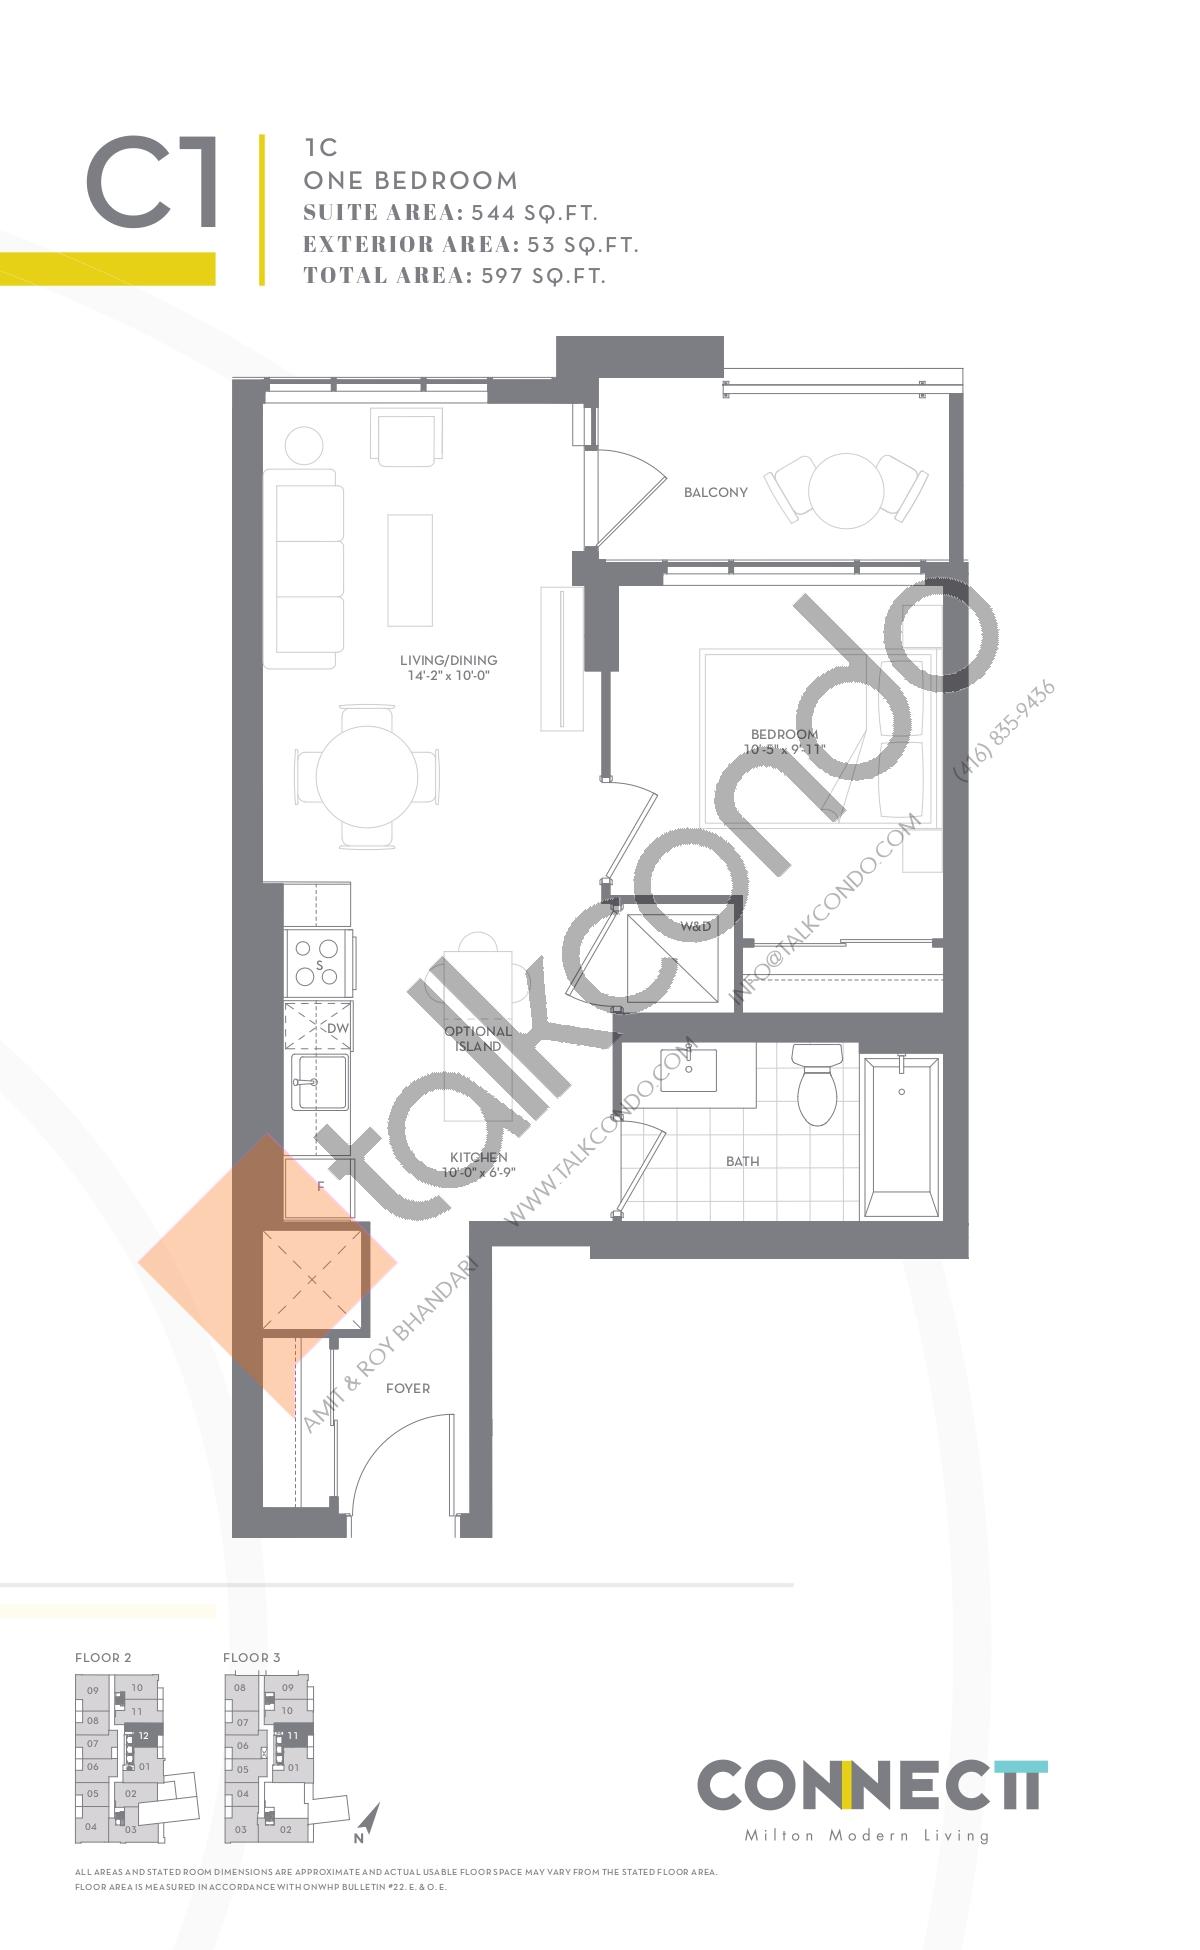 1C Floor Plan at Connectt Urban Community Condos - 544 sq.ft